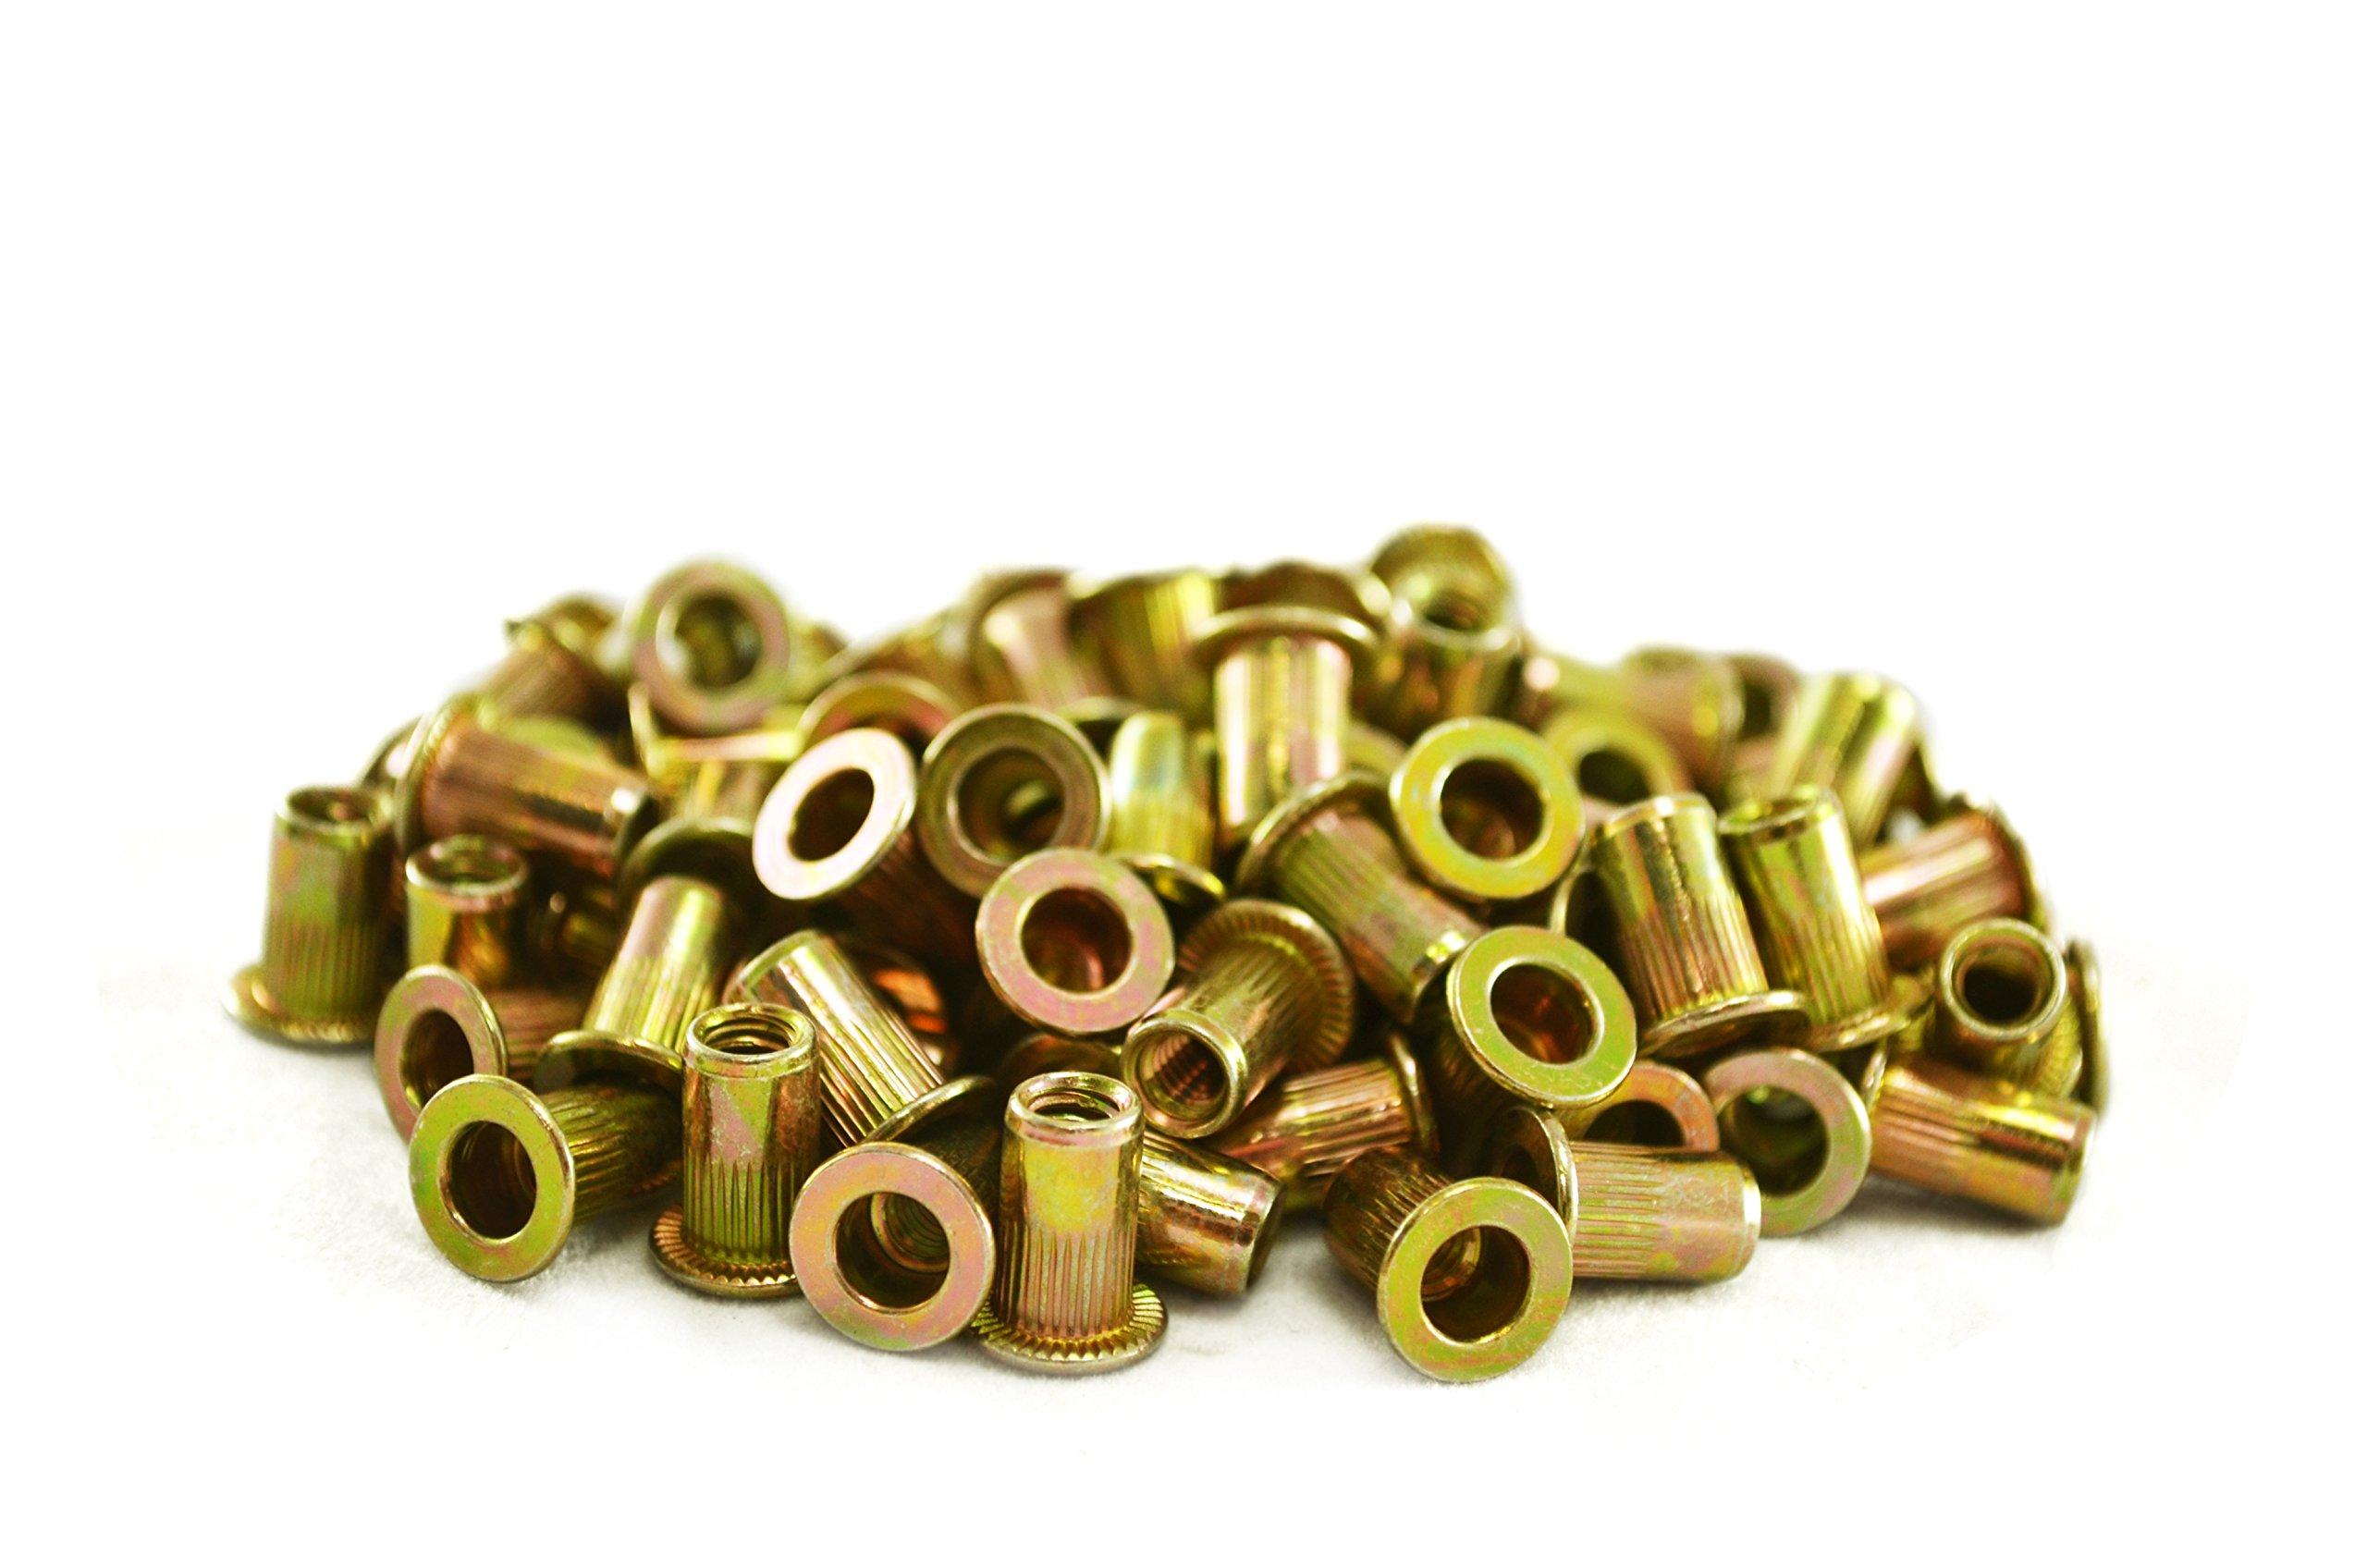 Astro Pneumatic Tool RN832 #8-32 Steel Rivet Nuts (100 Piece)